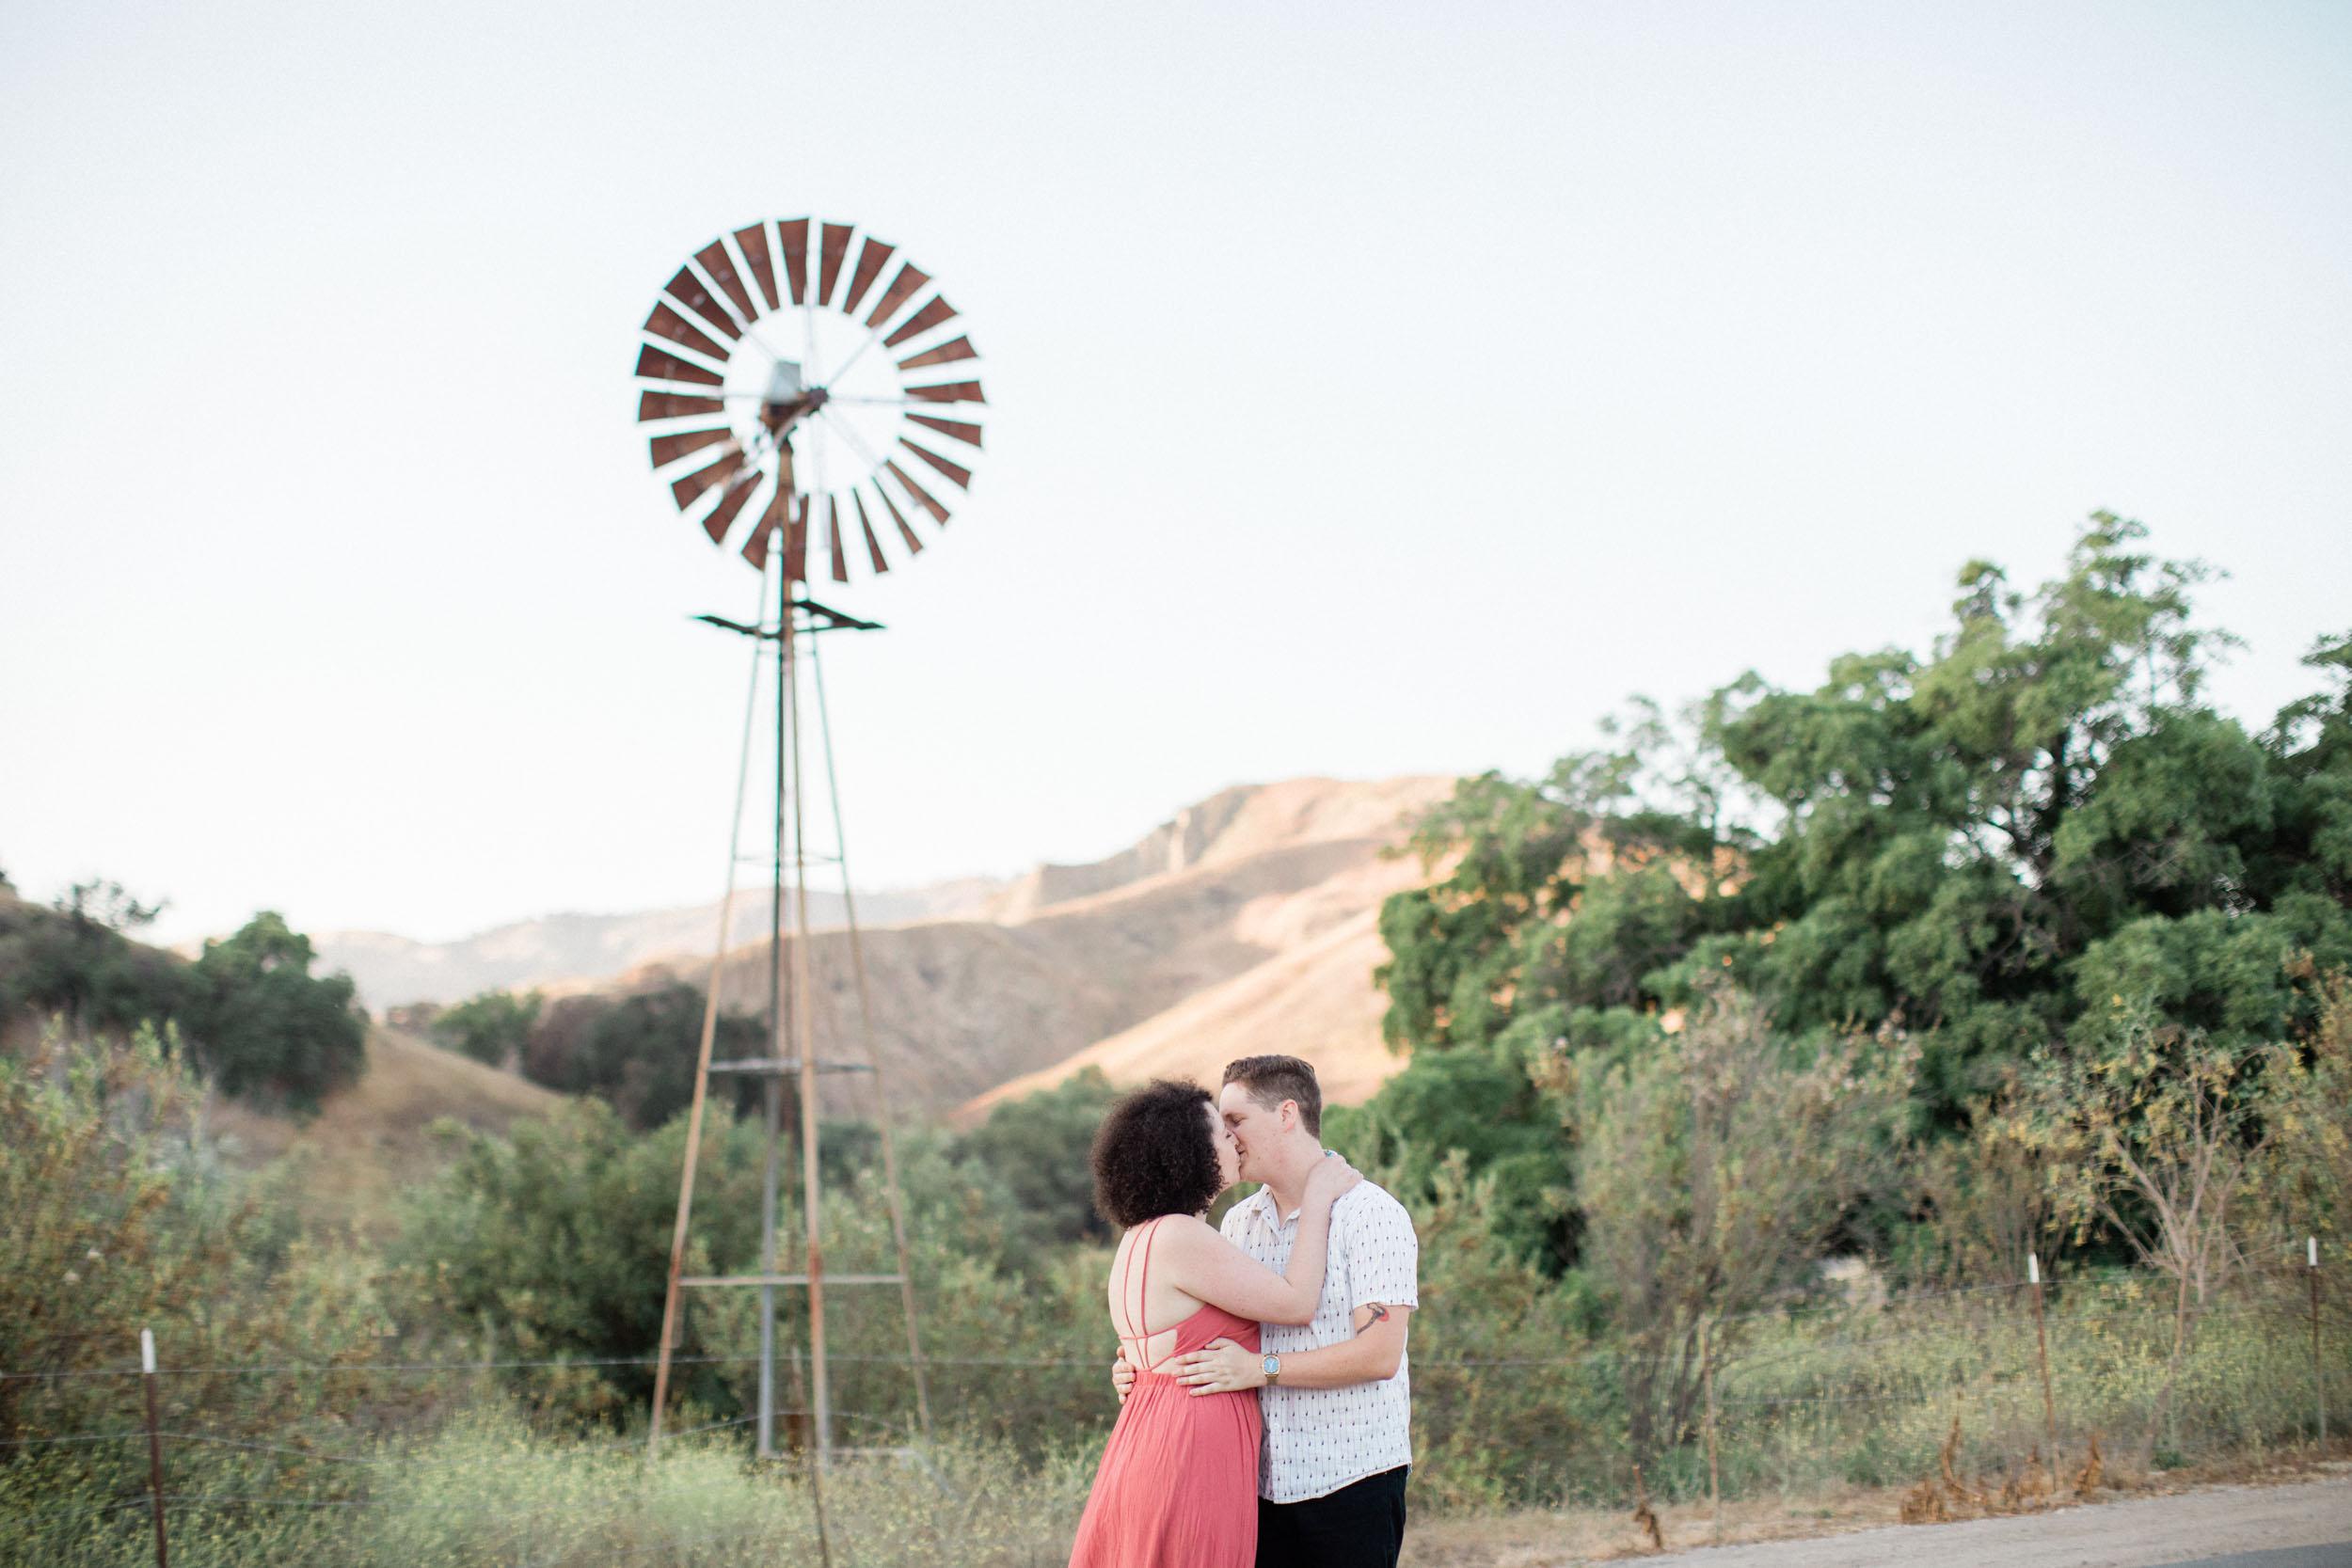 BKM-Photography-Ventura-Southern-California-Engagement-Wedding-0046.jpg